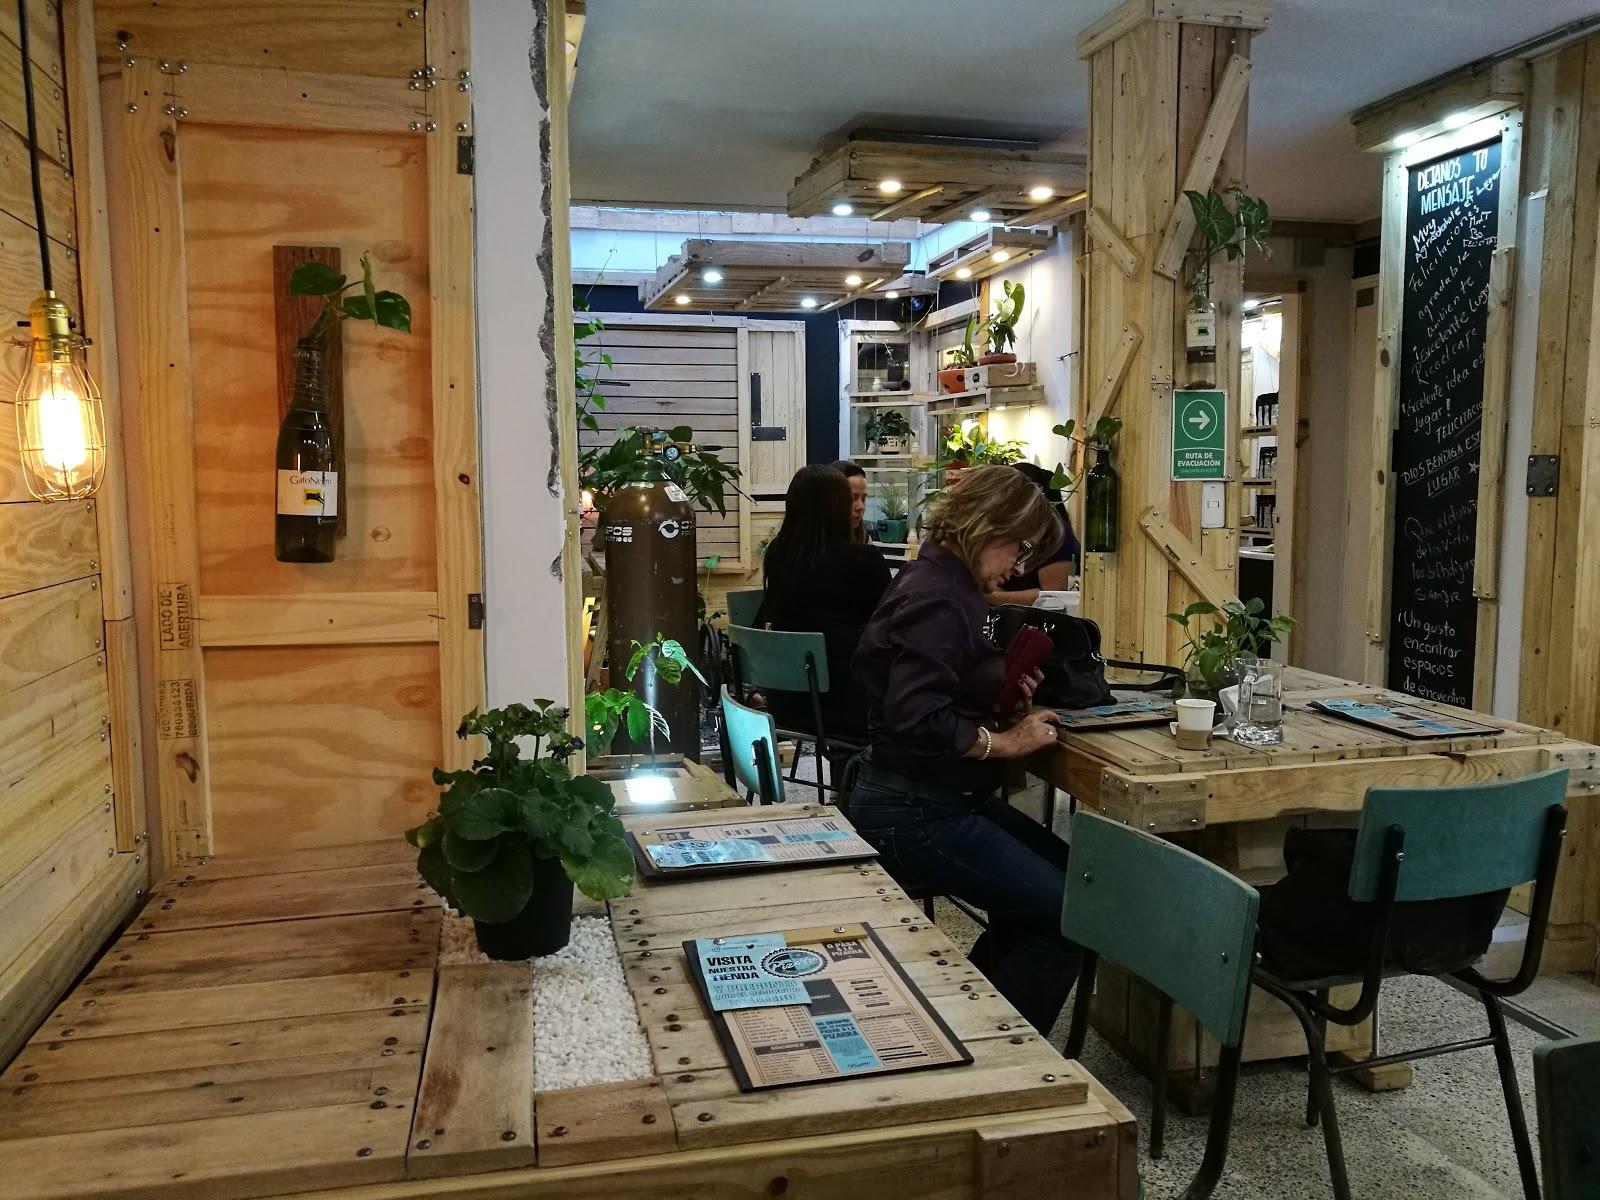 La Pizarra Café: A Work-Friendly Place in Medellin